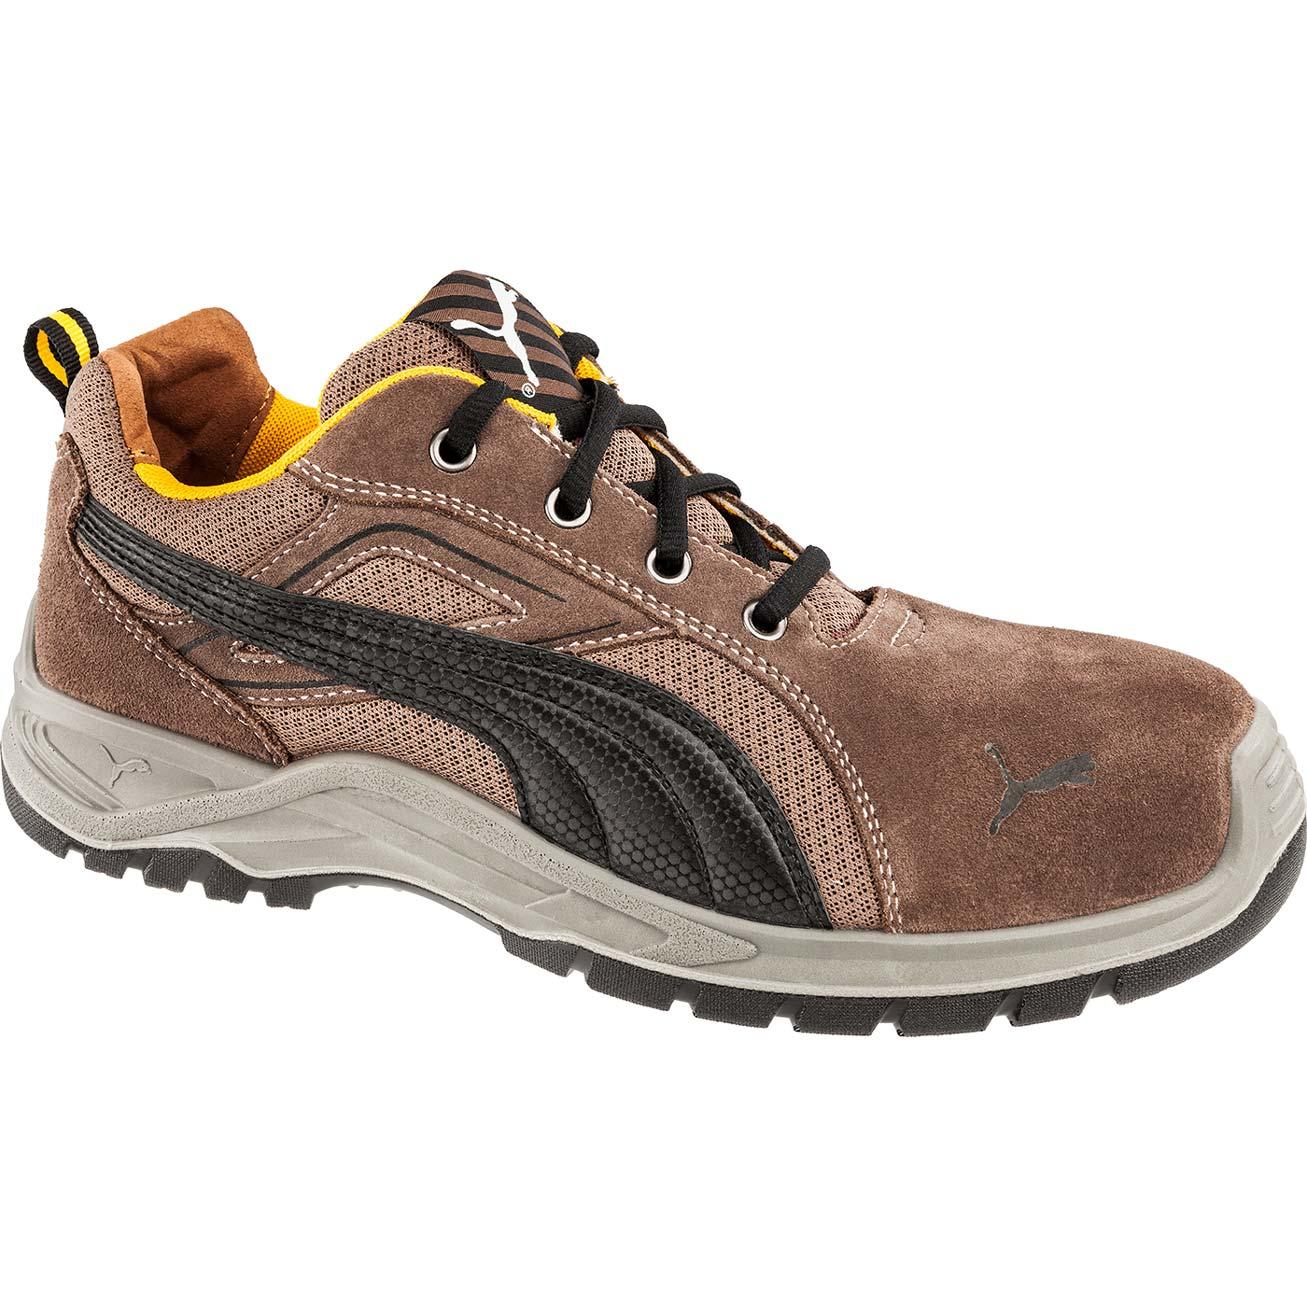 Puma Essentials Steel Toe Work Shoe P643645